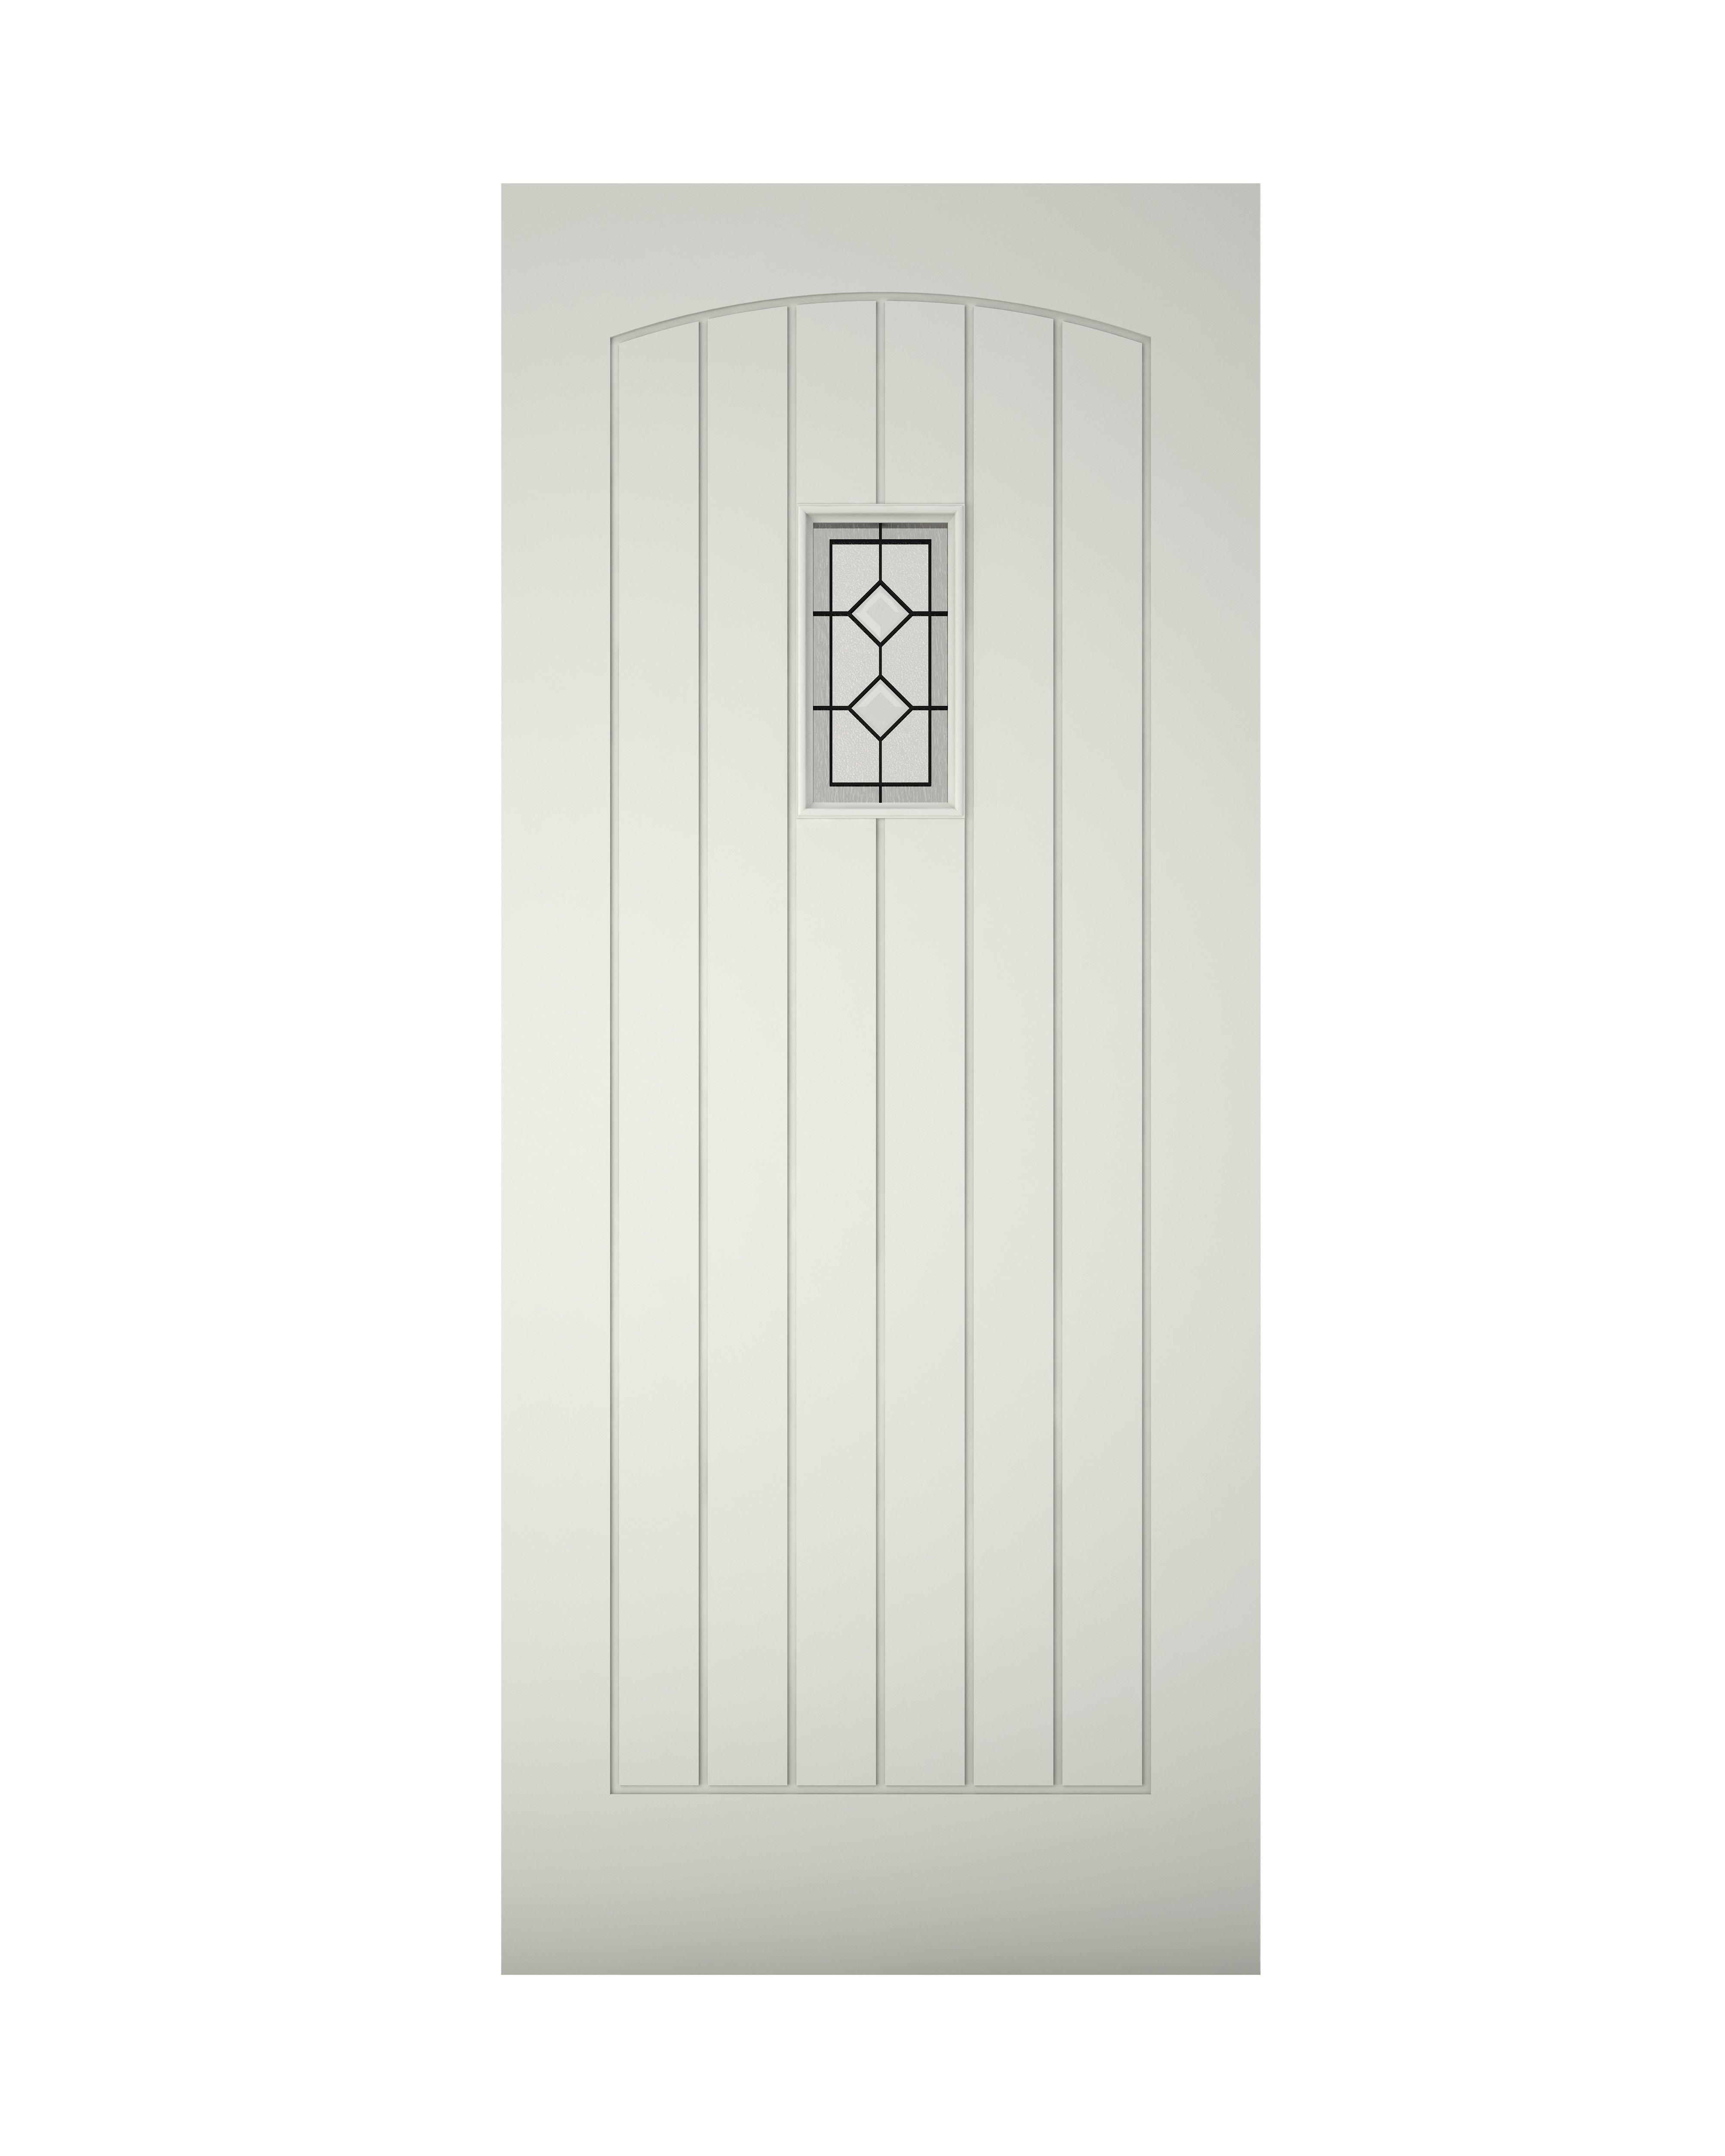 Cottage Panelled Primed Glazed Front Door Amp Frame H2074mm W932mm Departments DIY At BampQ